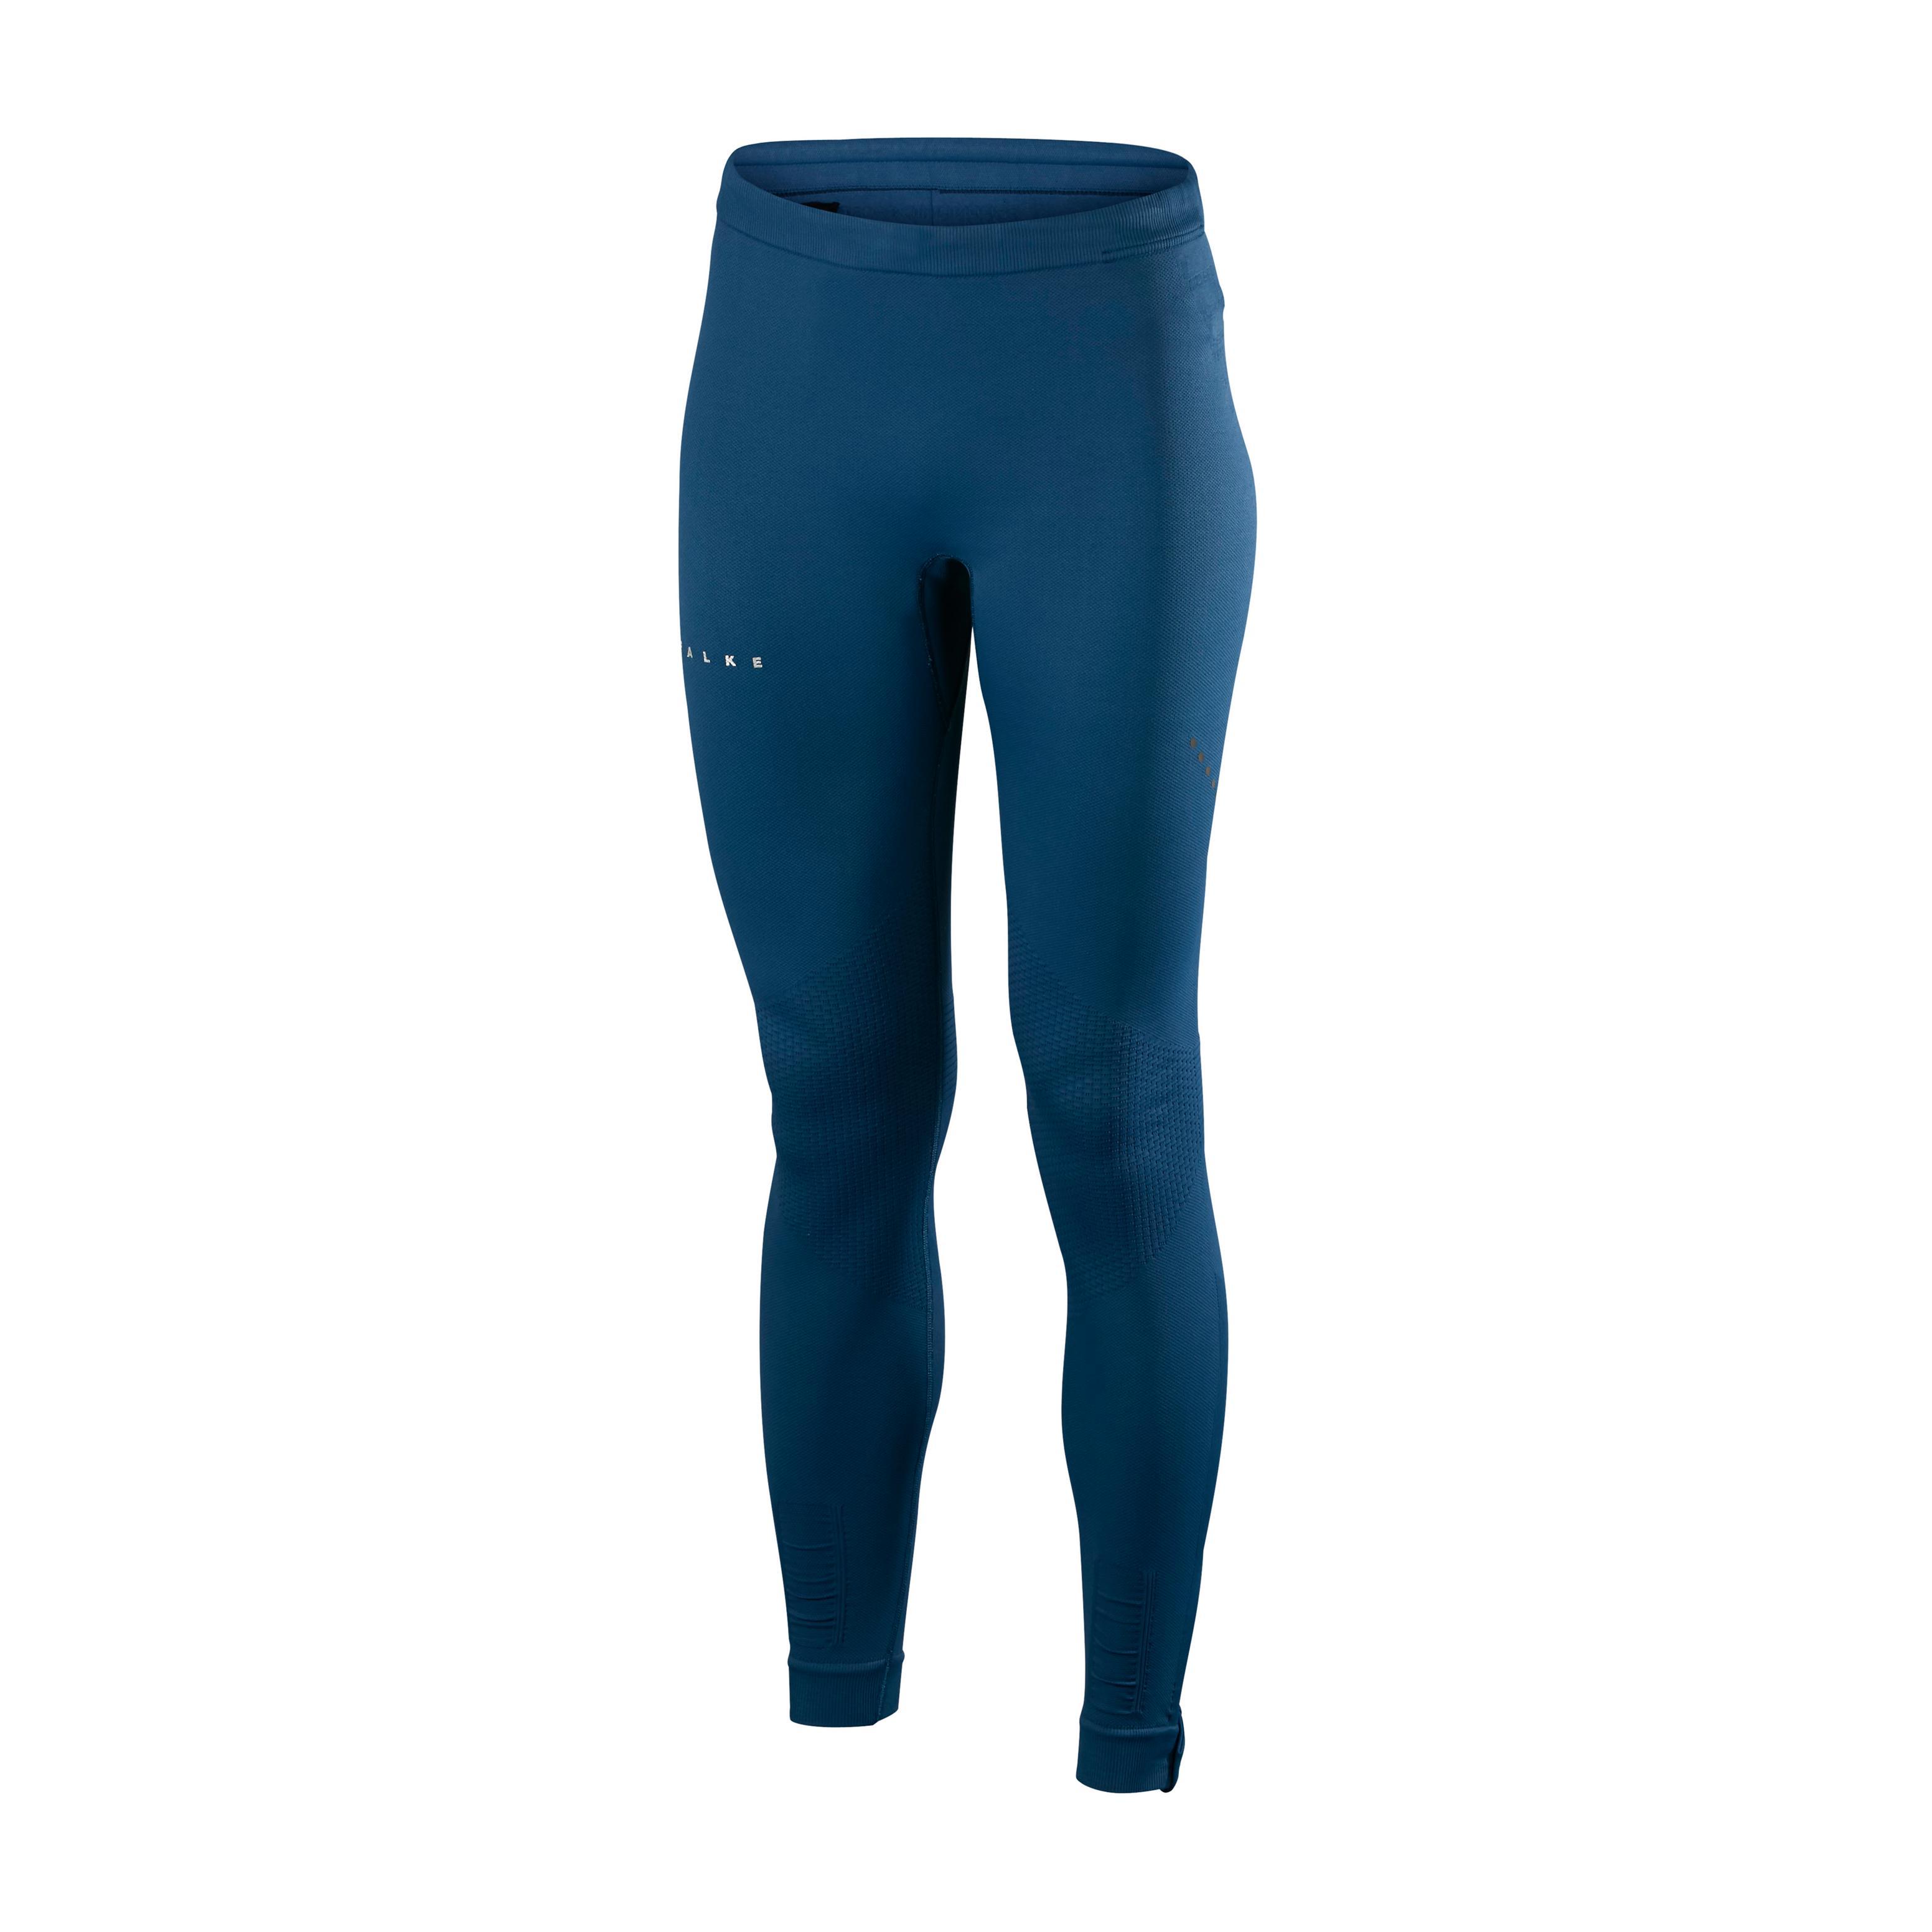 legging collant run dynamic falke bleu mod le femme. Black Bedroom Furniture Sets. Home Design Ideas